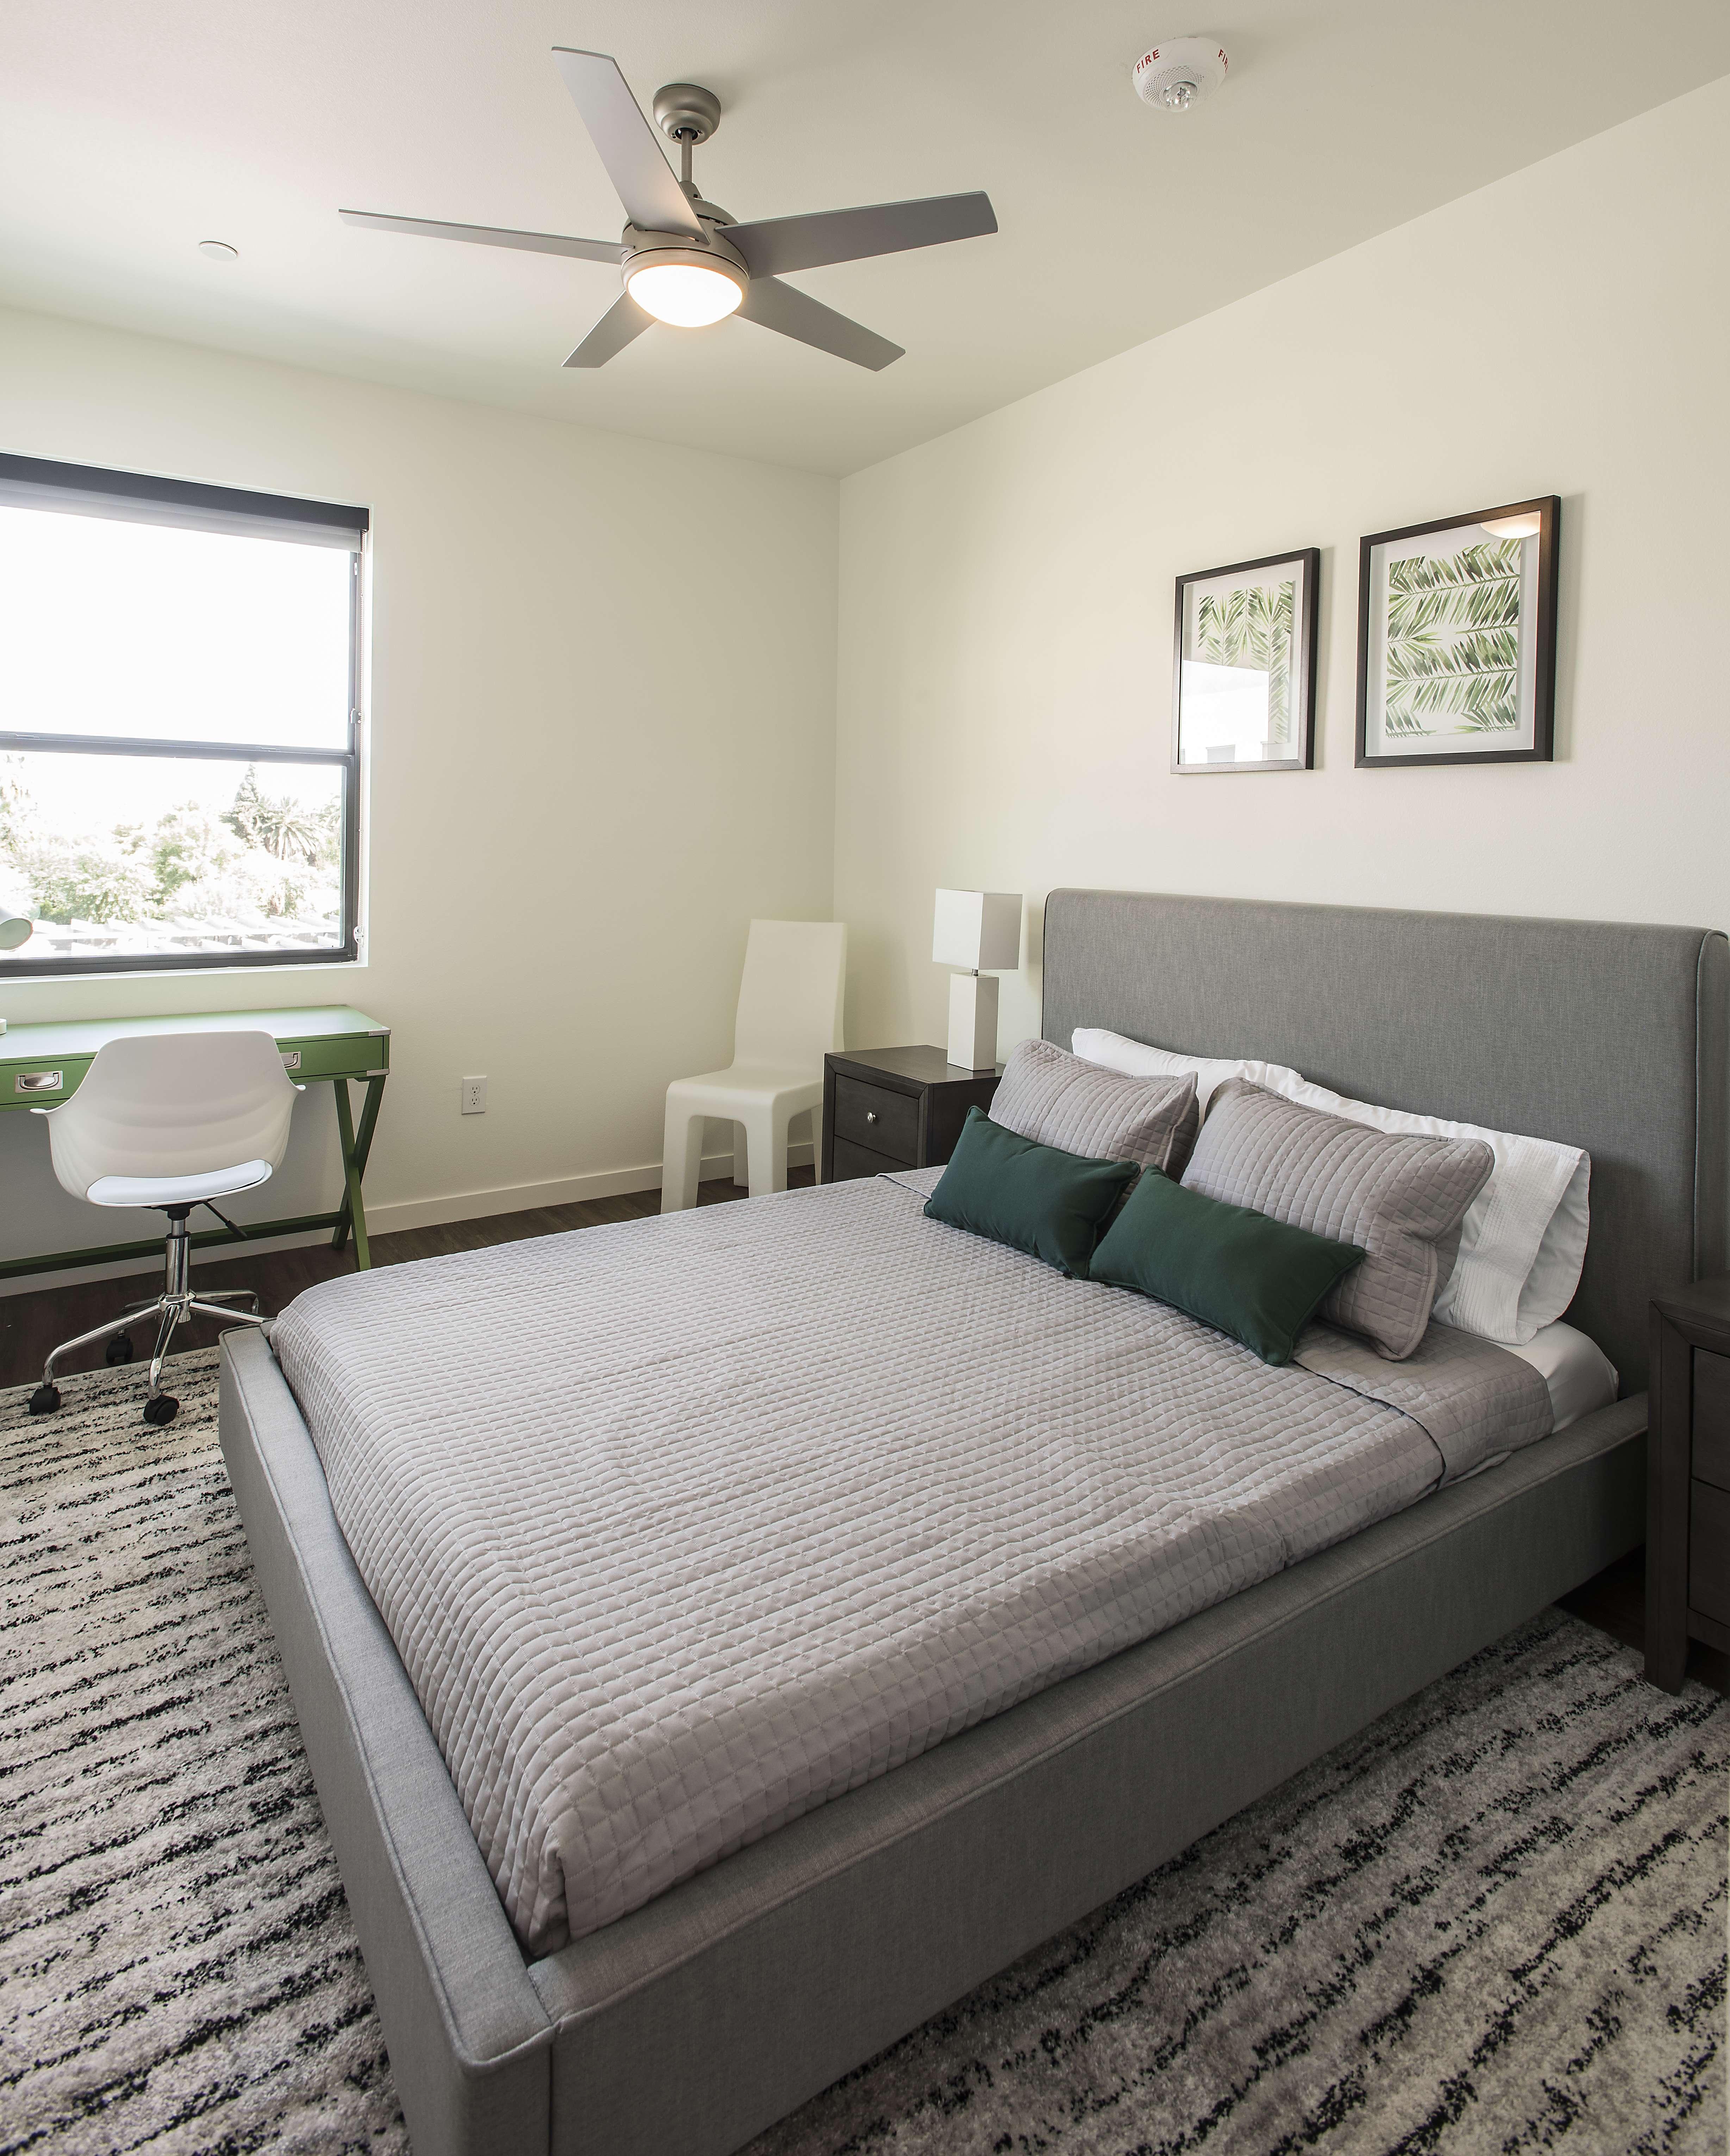 Apartments Phoenix Az First Month Free: First Place–Phoenix Apartments Floor Plans